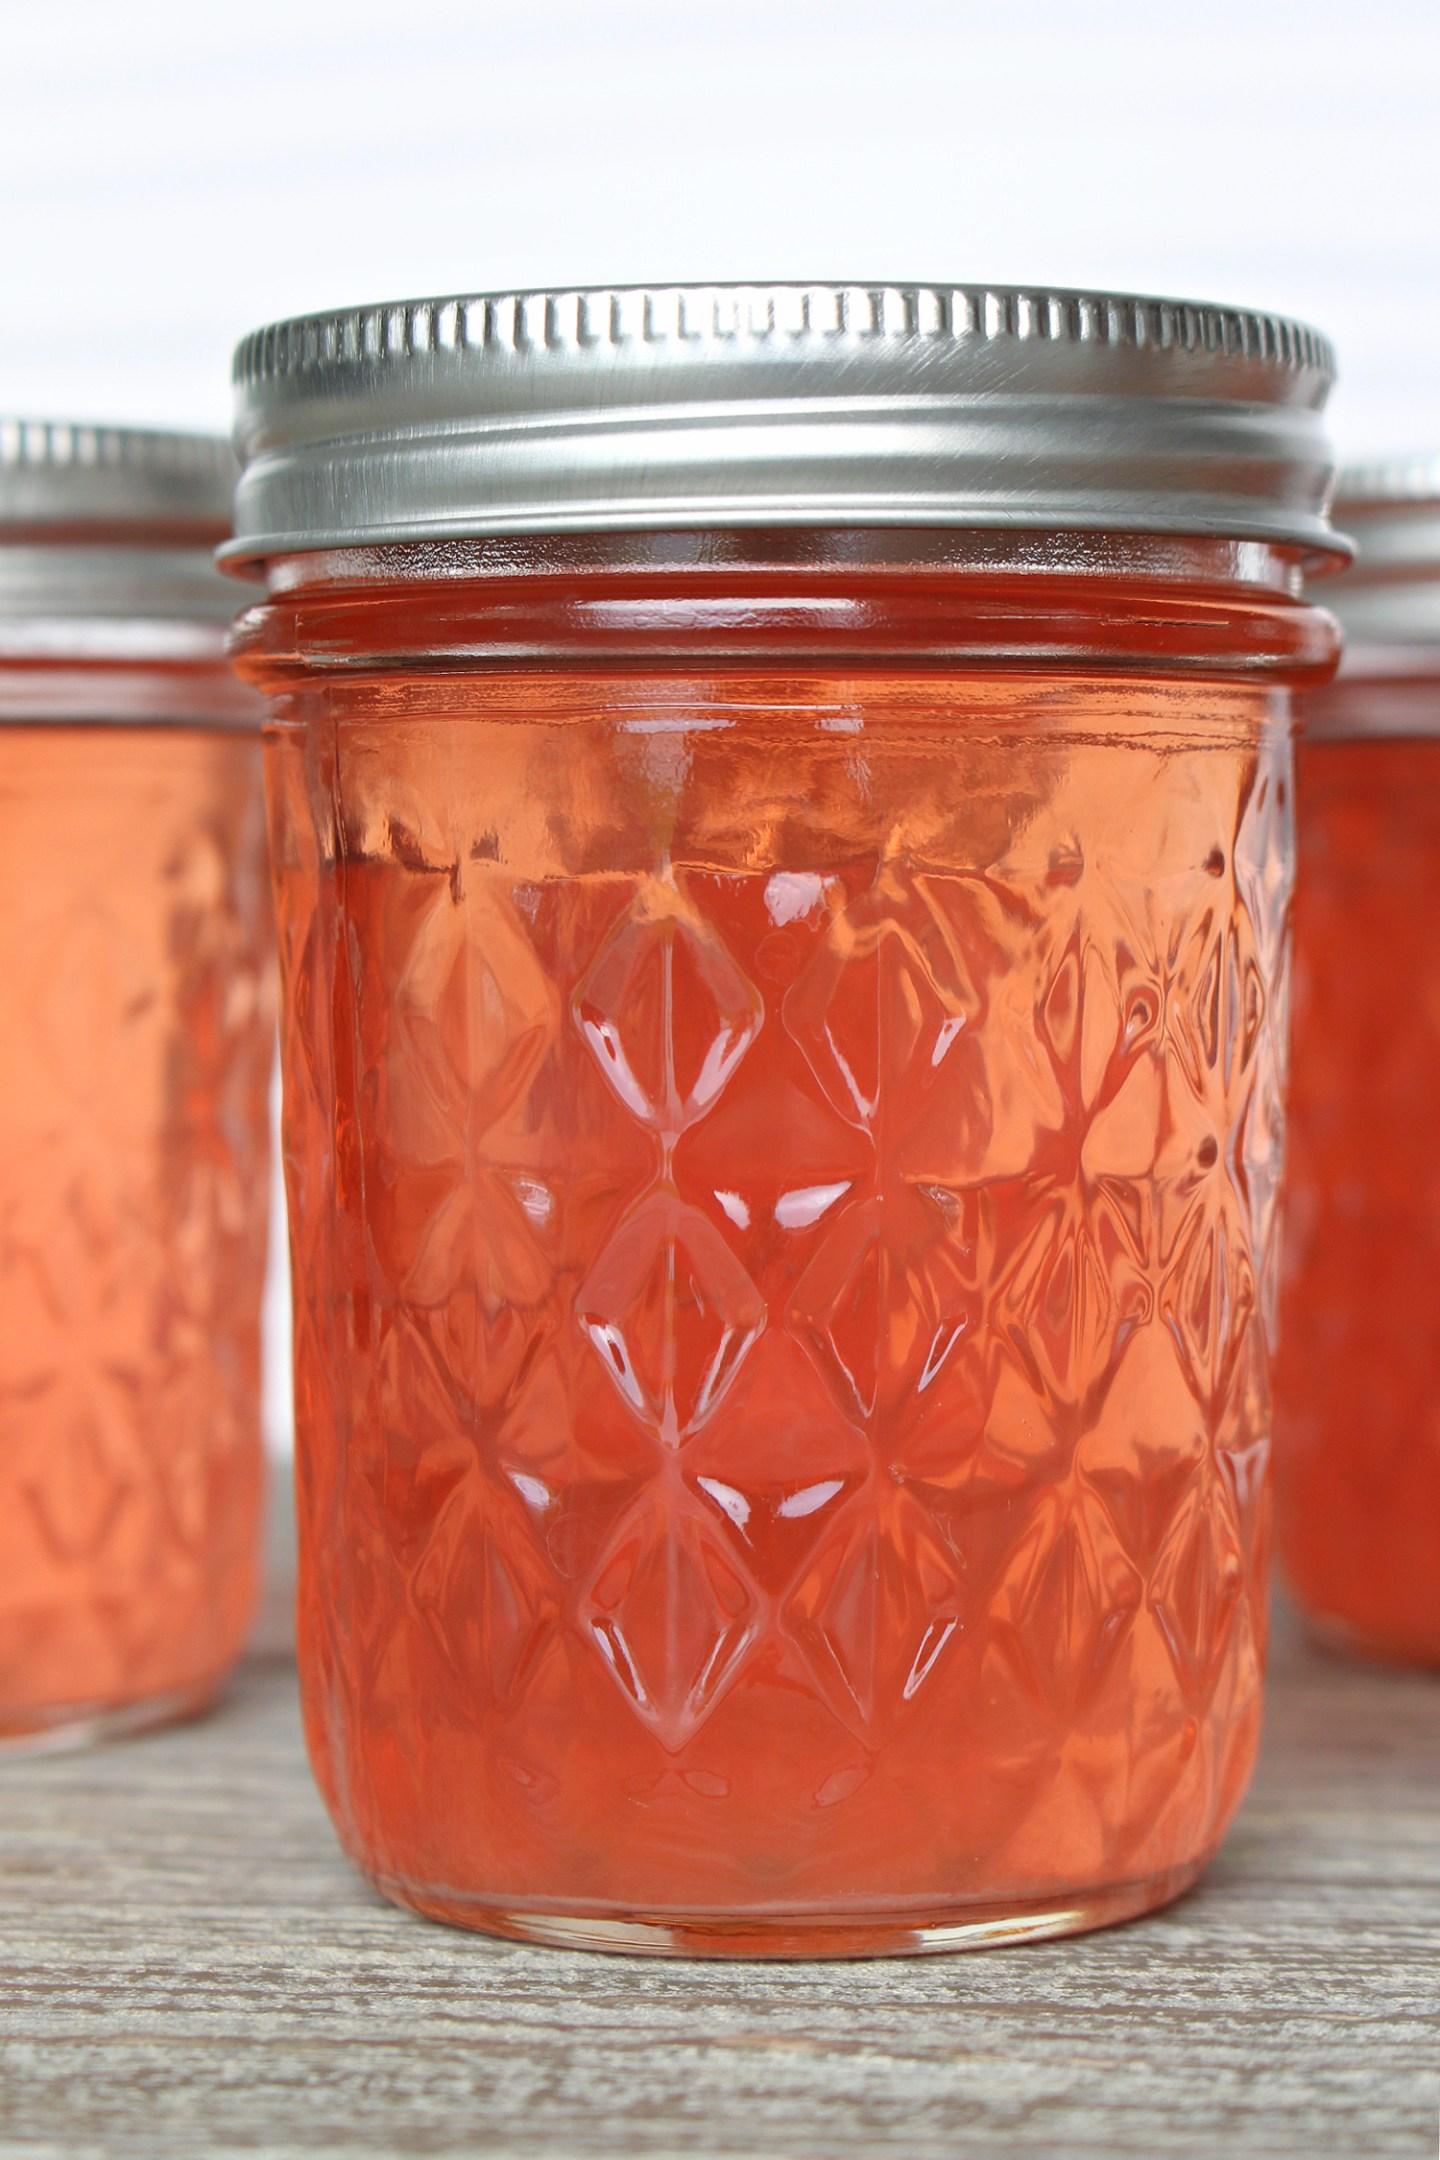 How to Make Rhubarb Drinks